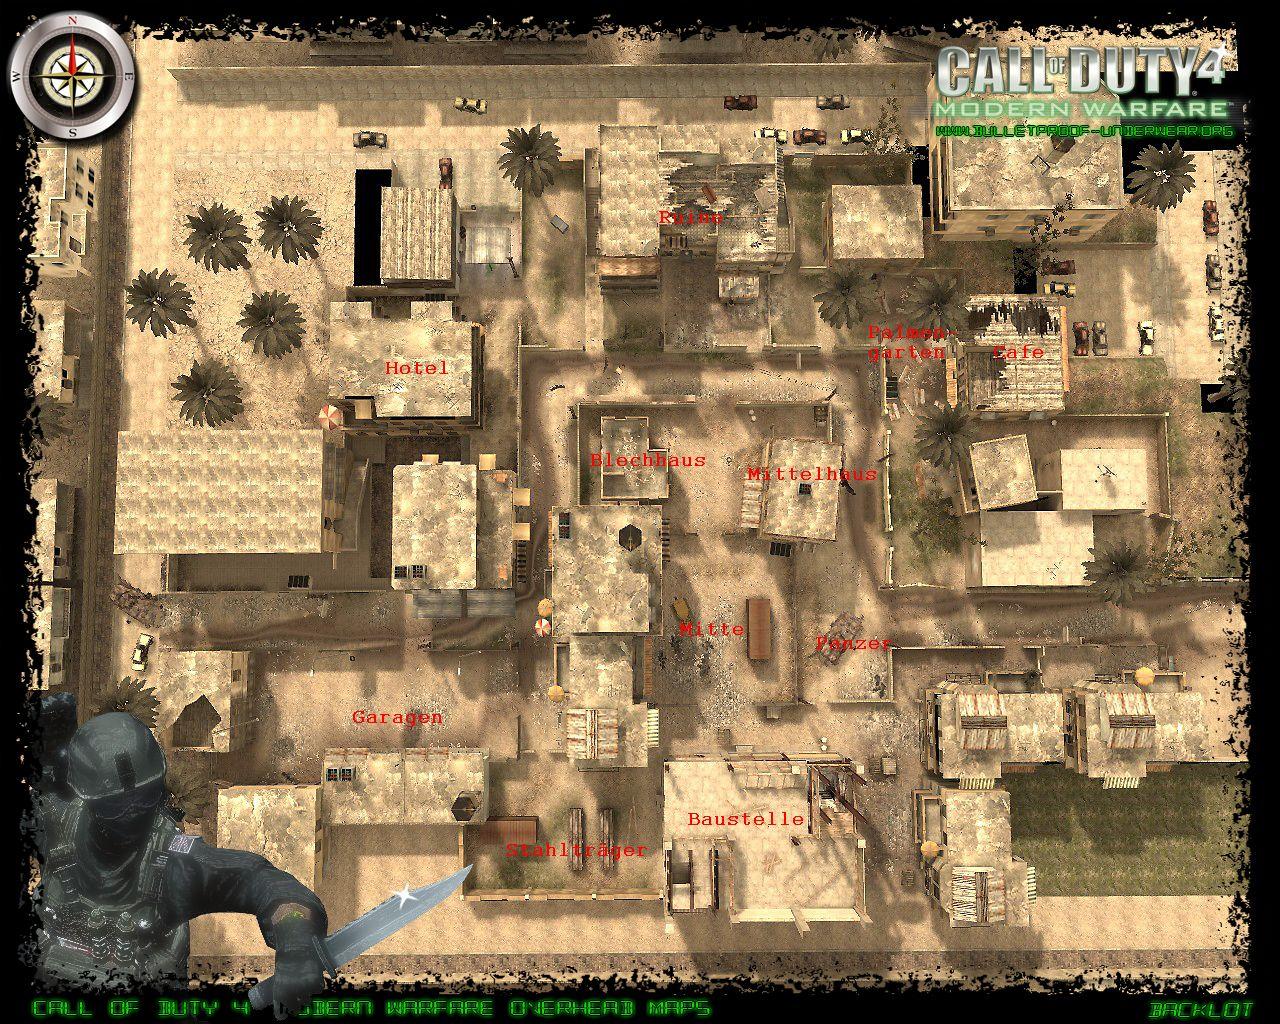 Call of Duty 4 Taktik Maps | UW-Gaming.de - United Warriors Gaming Call Of Duty Maps on